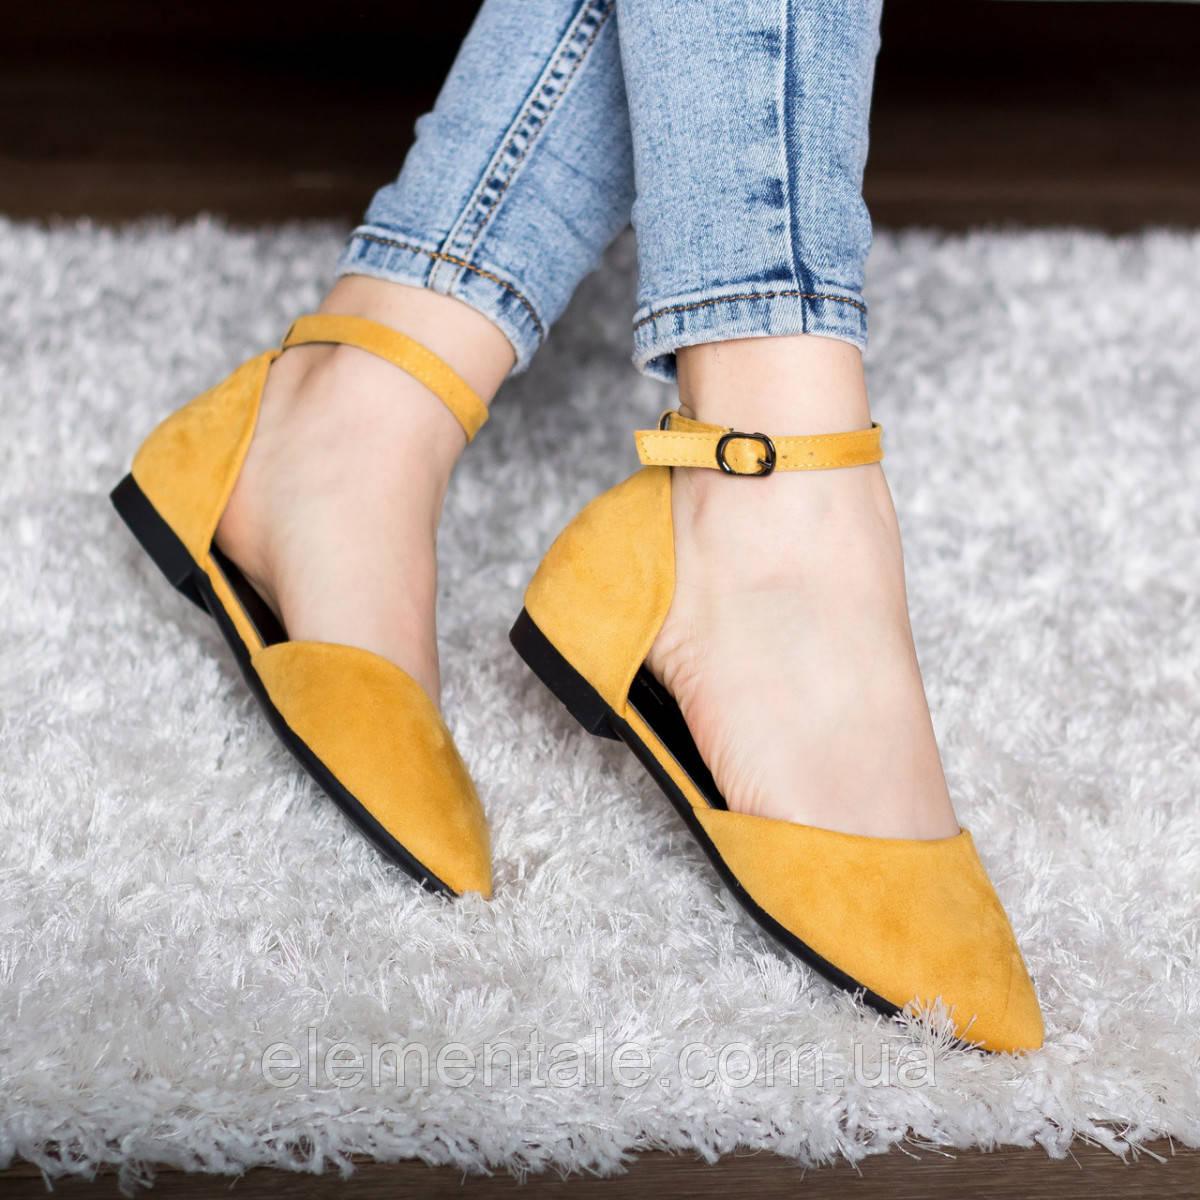 Туфли женские 41 размер 26 см Желтые